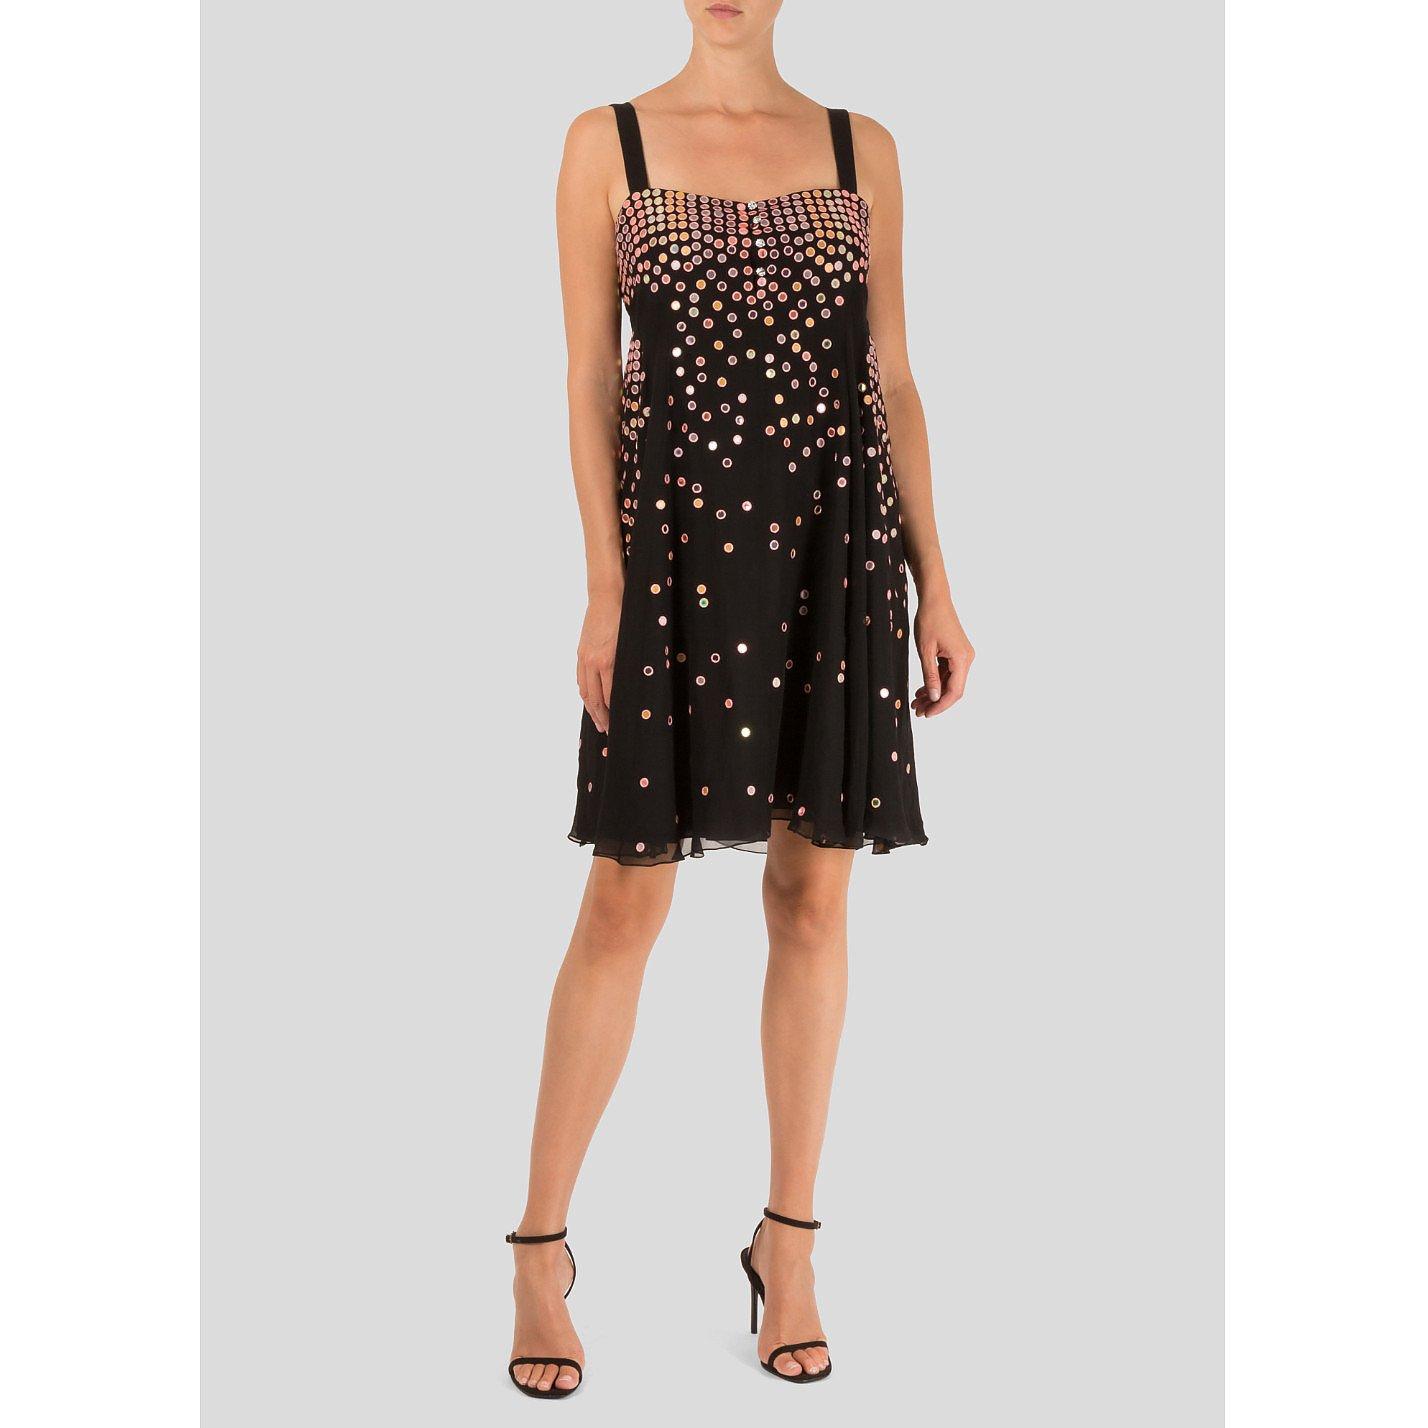 Matthew Williamson Sequin Embellished Mini Dress